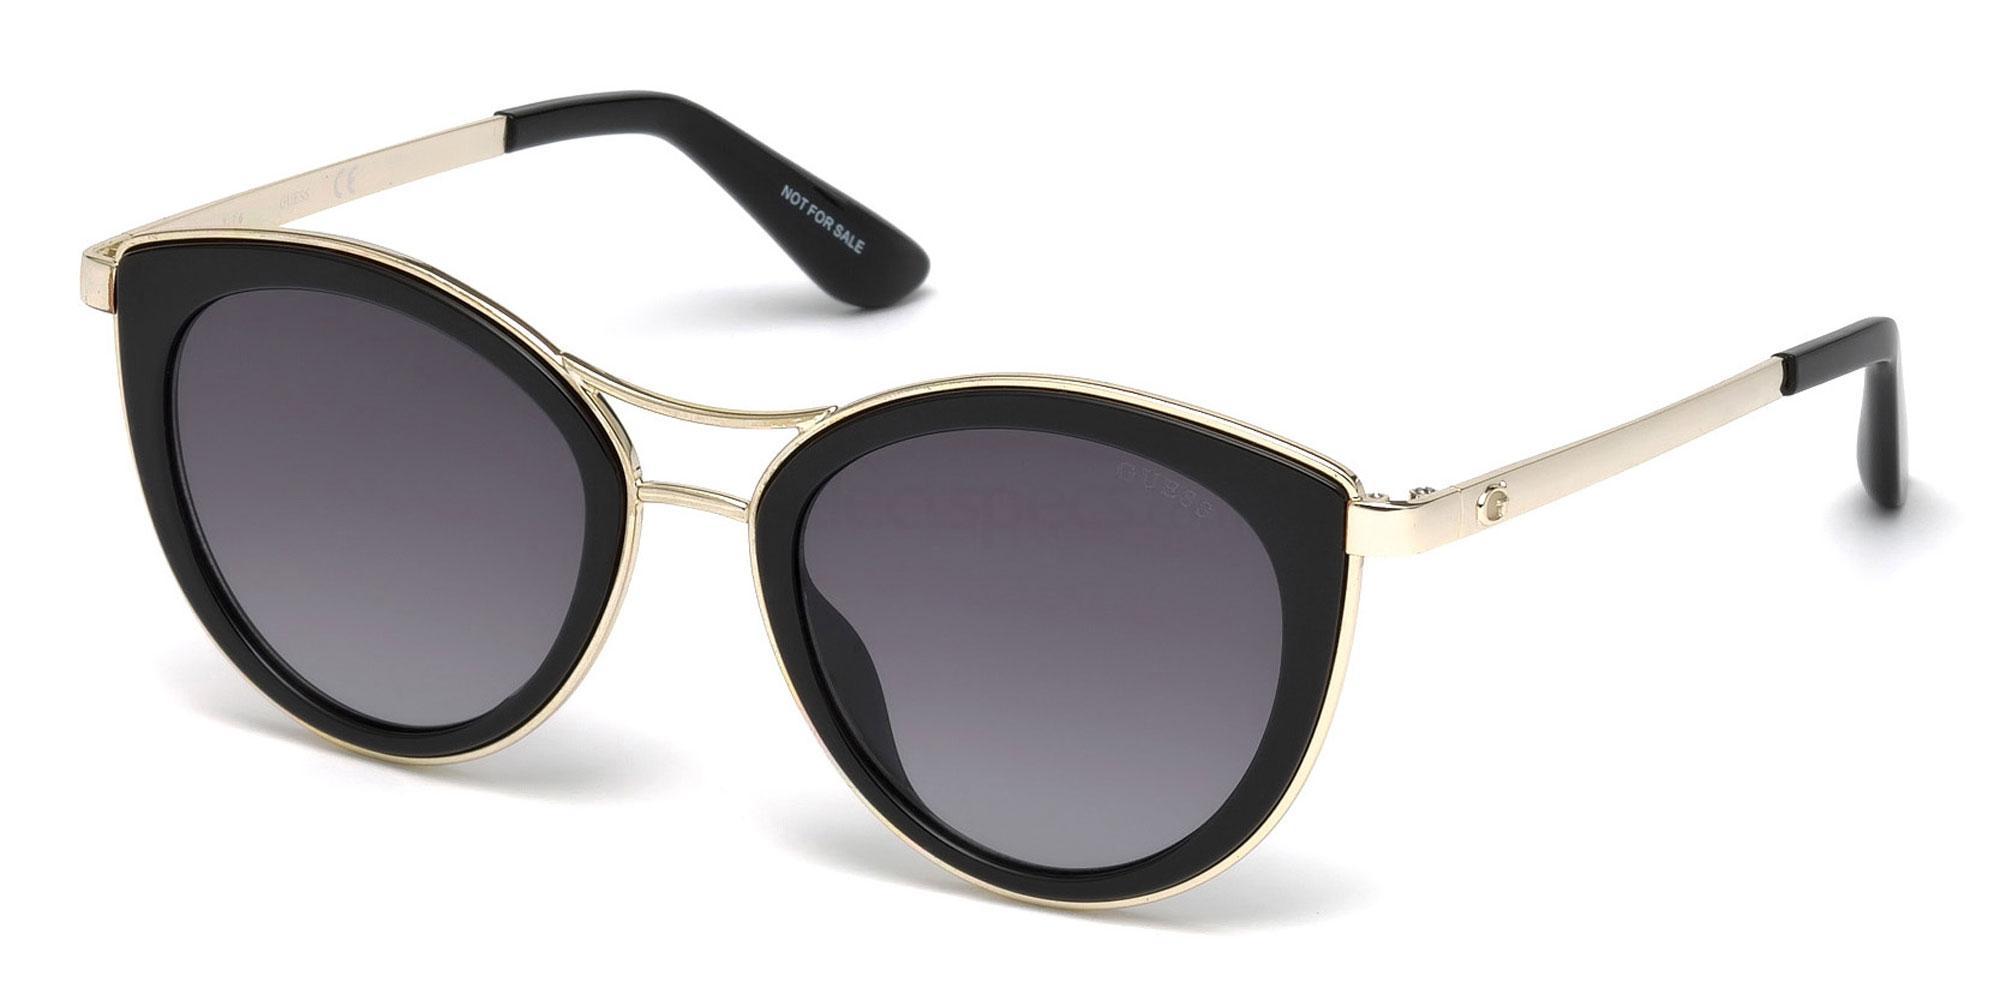 01B GU7490 Sunglasses, Guess